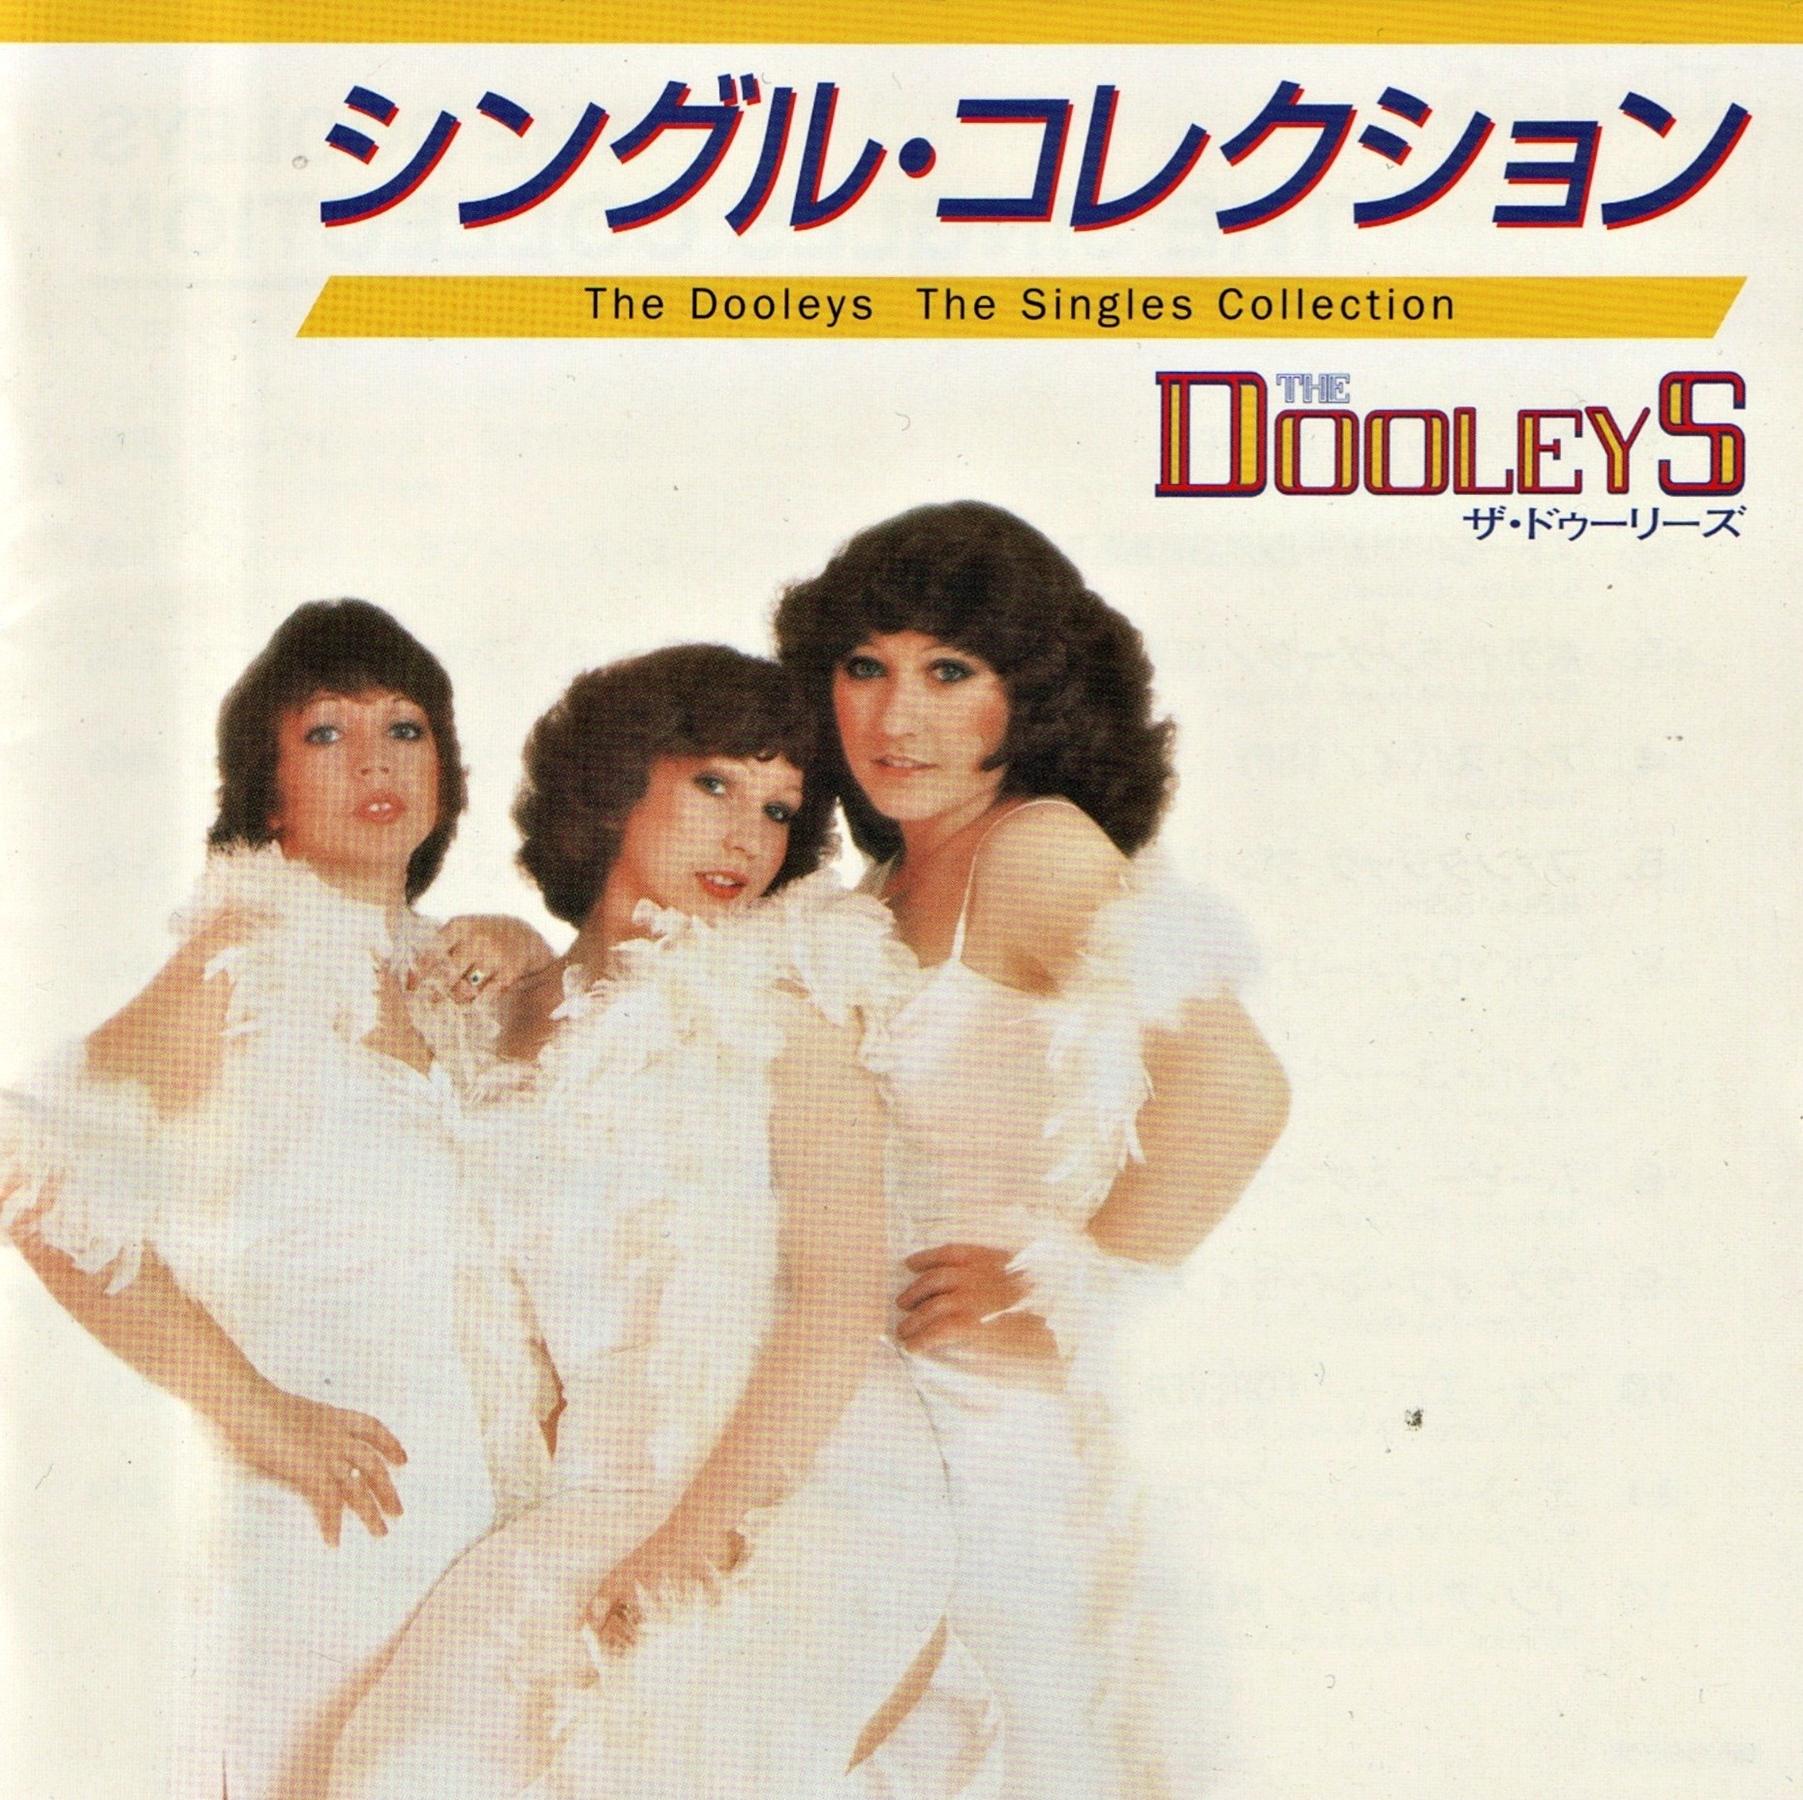 The Dooleys - Wanted